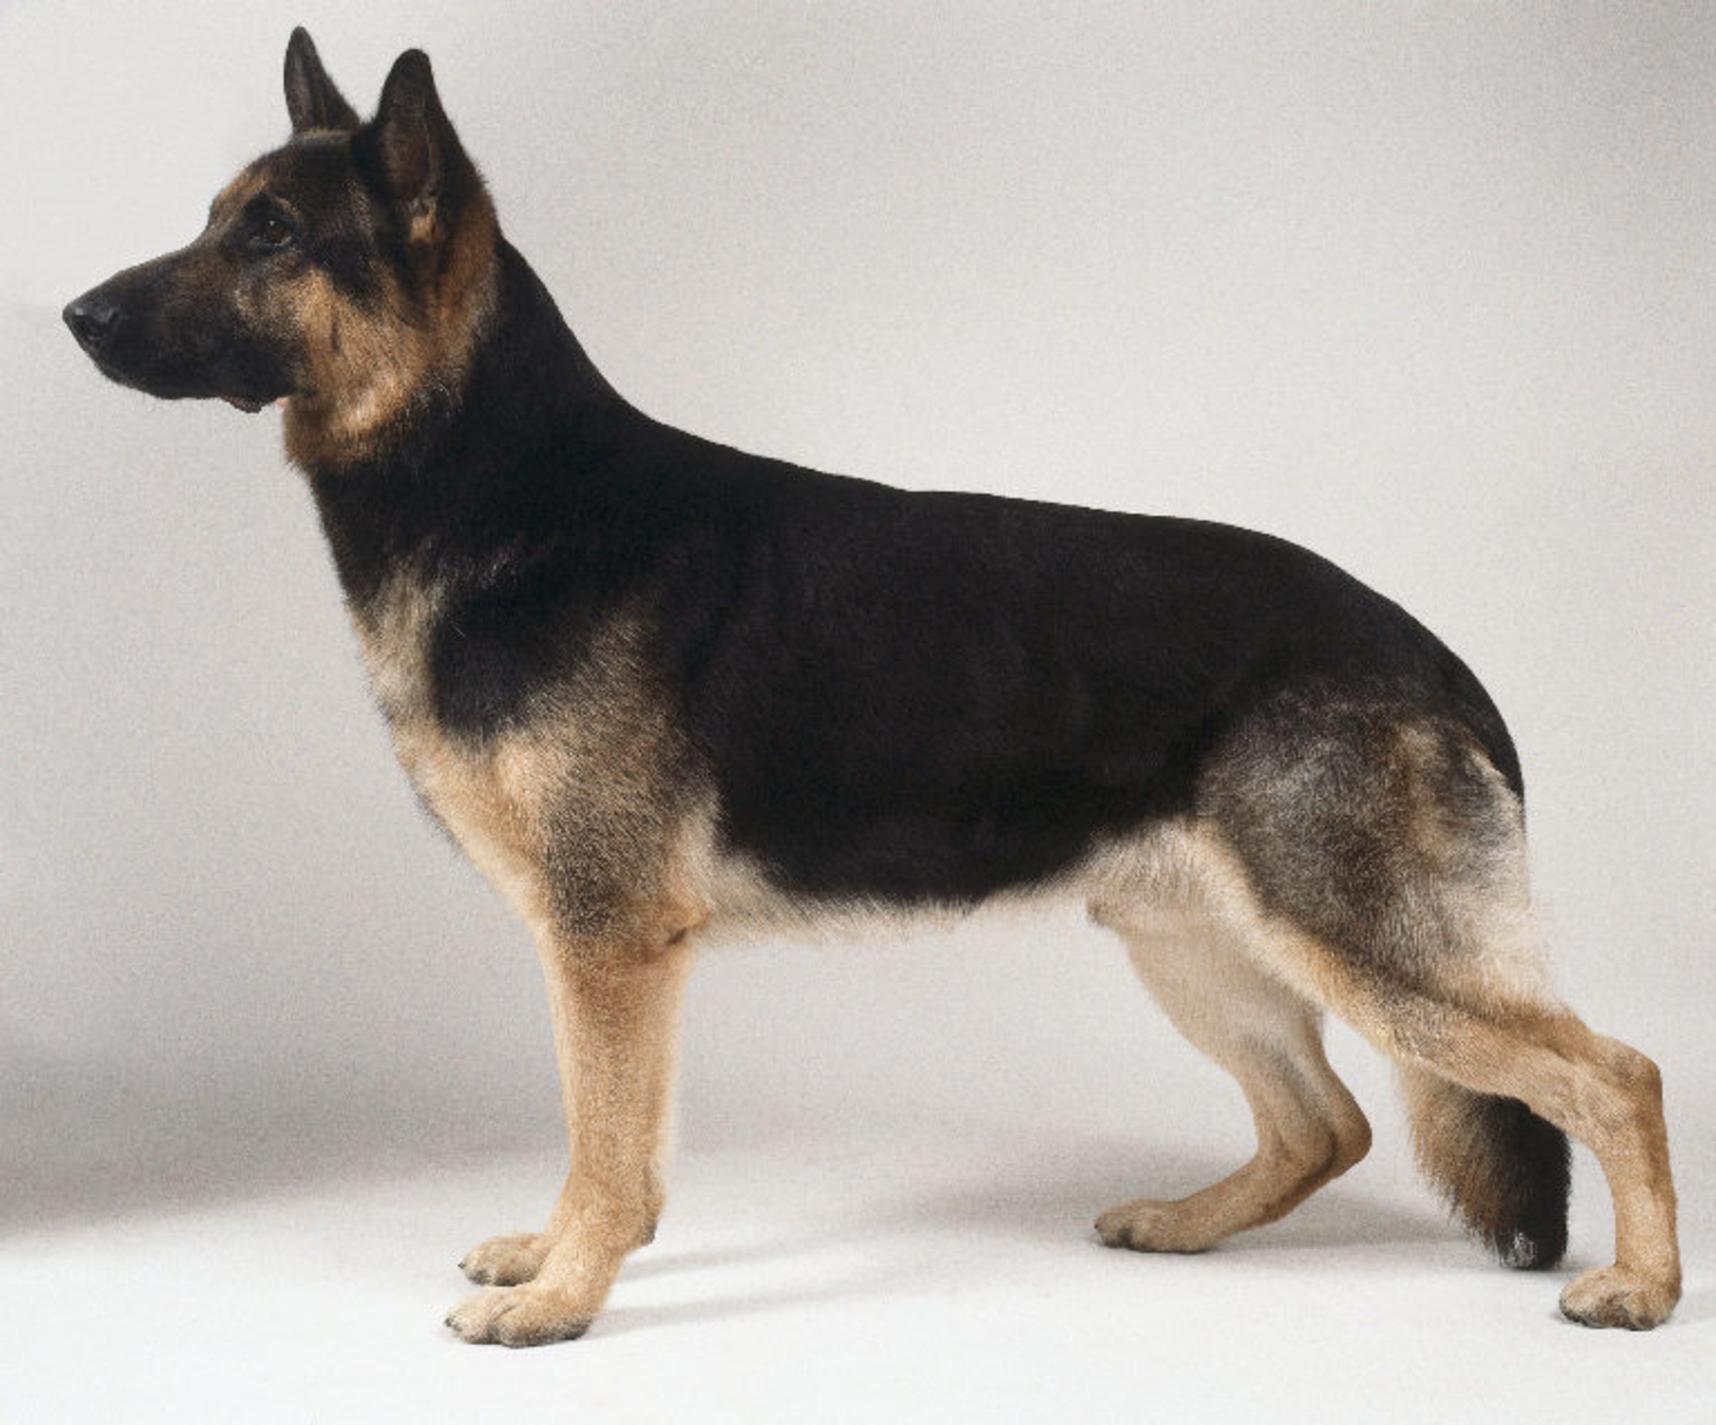 German Shepherd Dog wallpapers HD